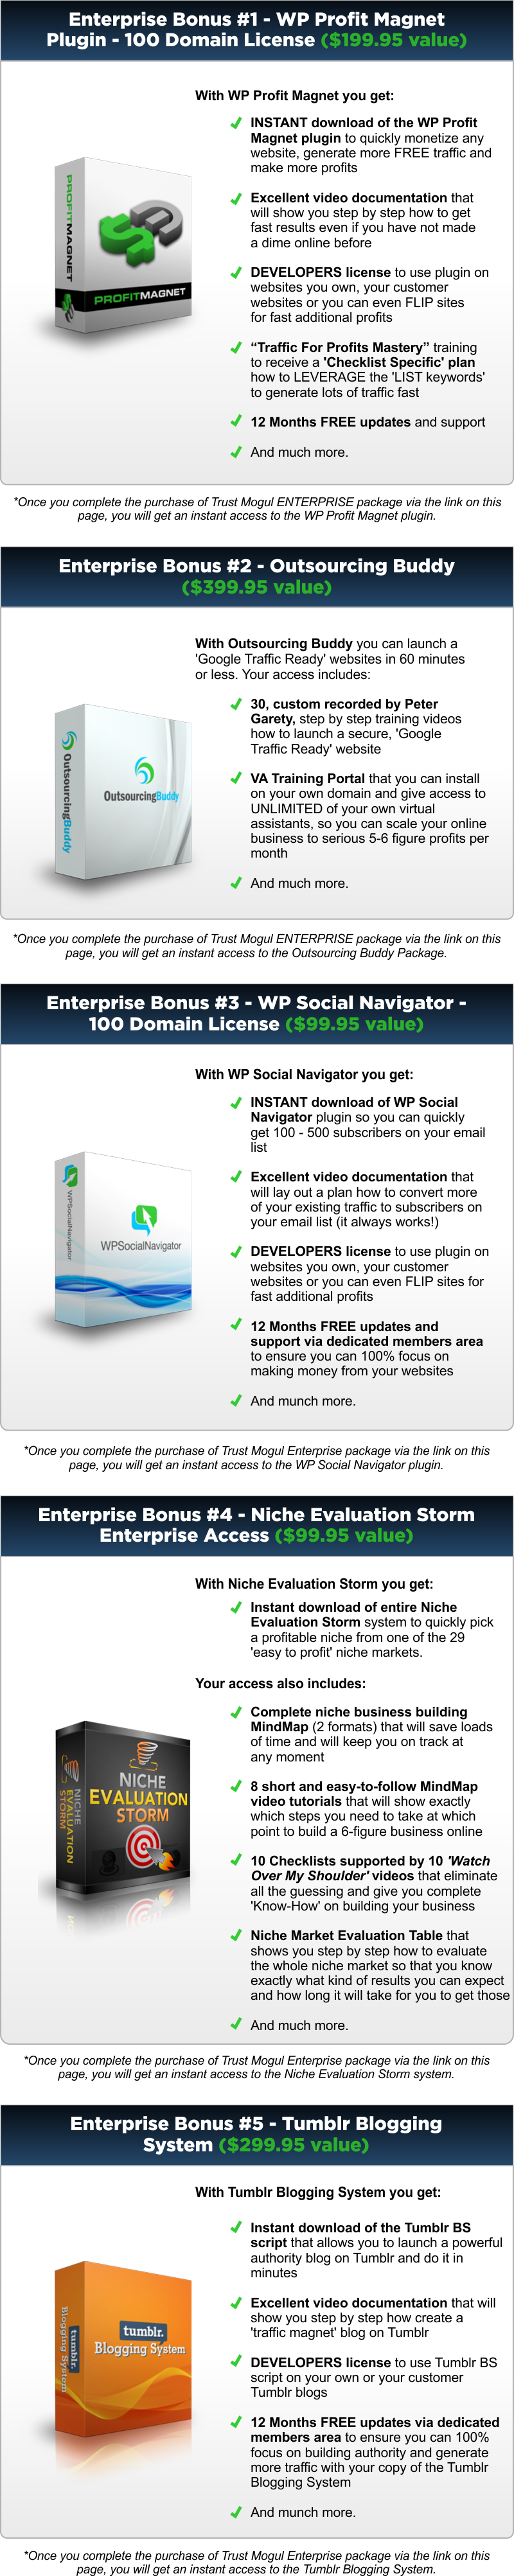 Trust Mogul Enterprise Bonus